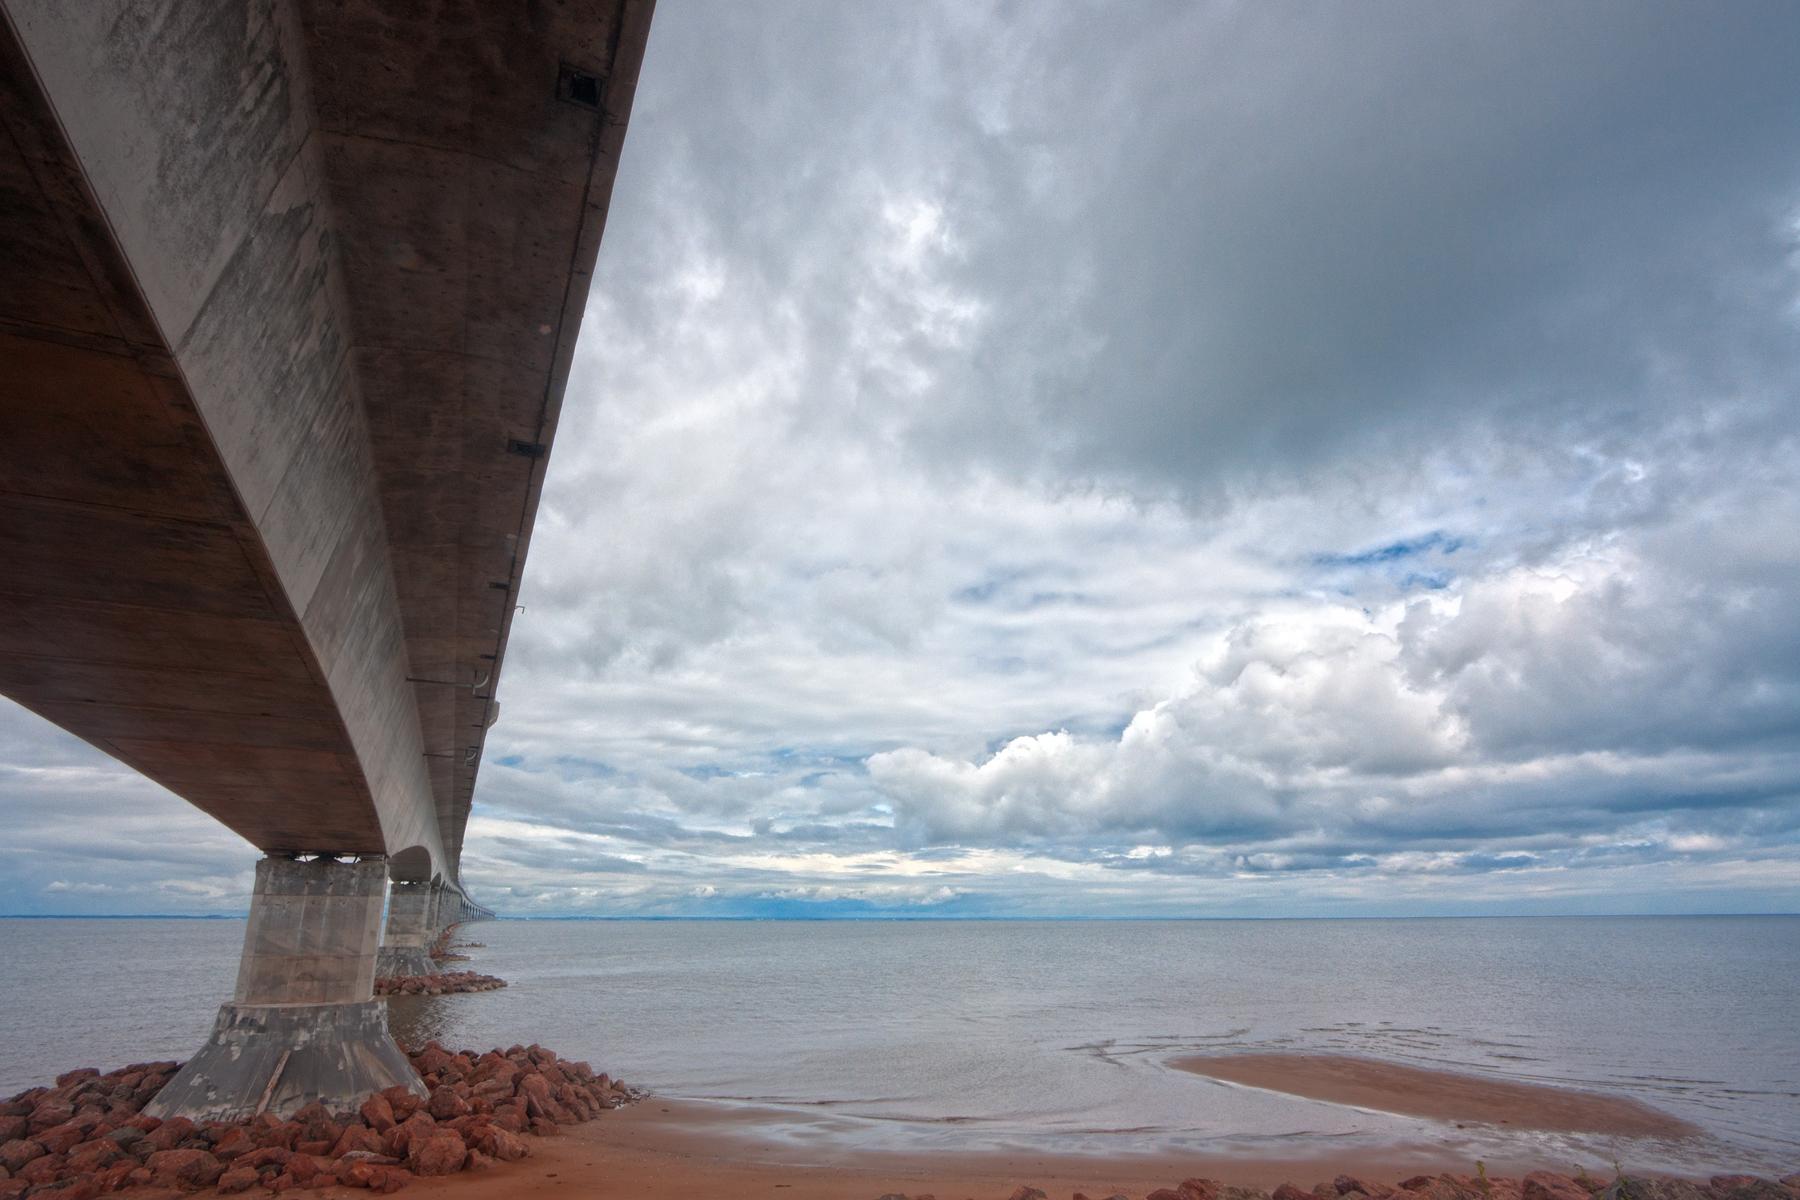 Confederation Bridge - HDR, Angle, Scene, Ocean, PEI, HQ Photo